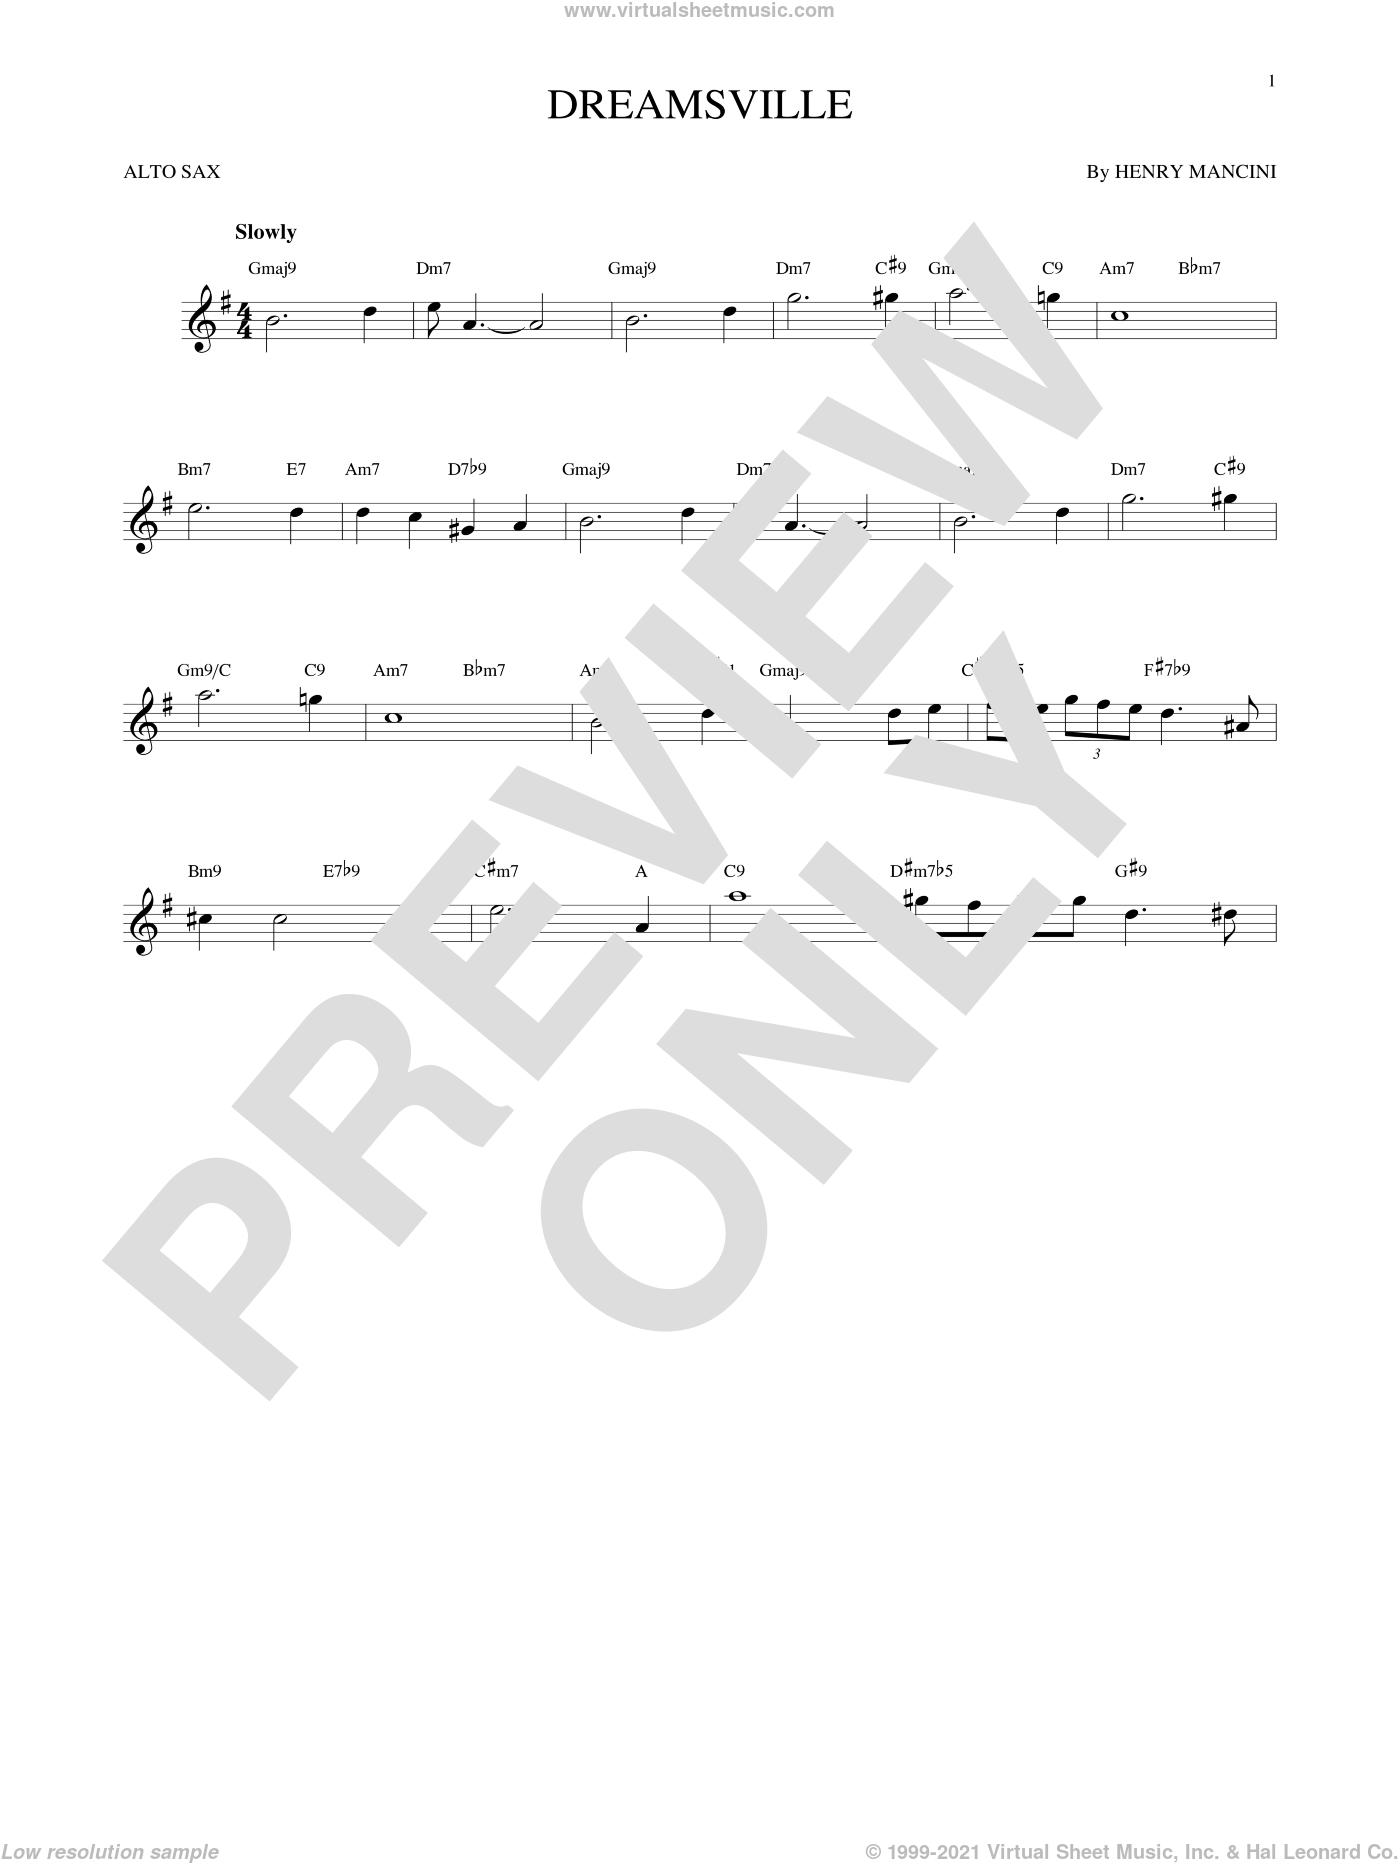 Dreamsville sheet music for alto saxophone solo by Henry Mancini, intermediate skill level